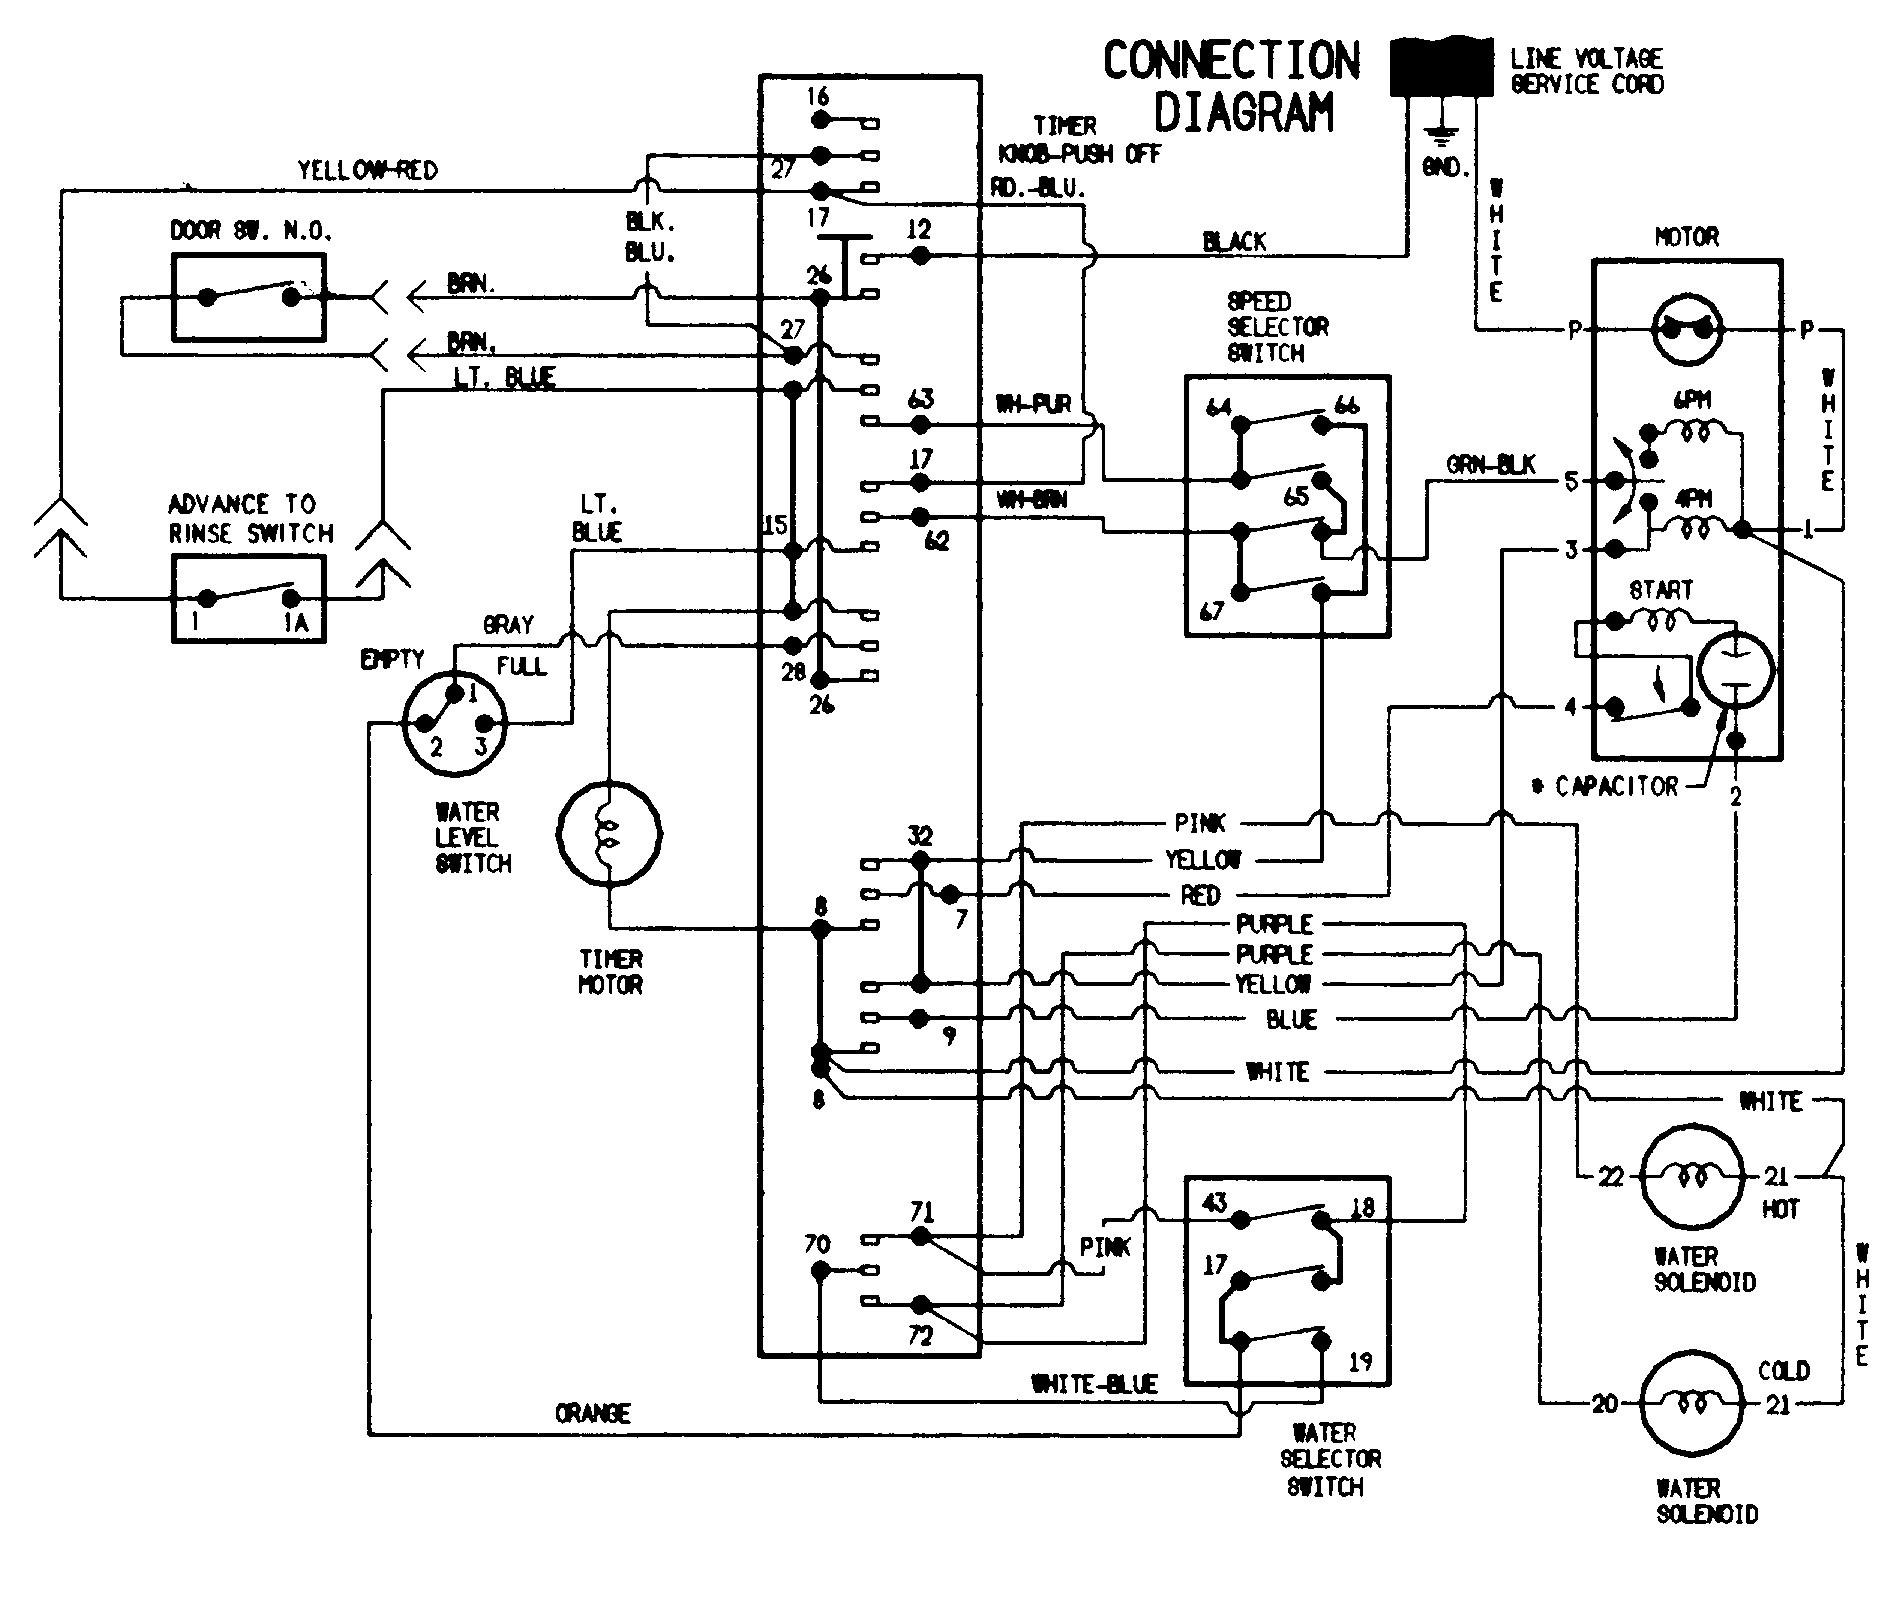 Wiring Diagram Whirlpool Dryer Best Maytag Washer Wiring Diagram